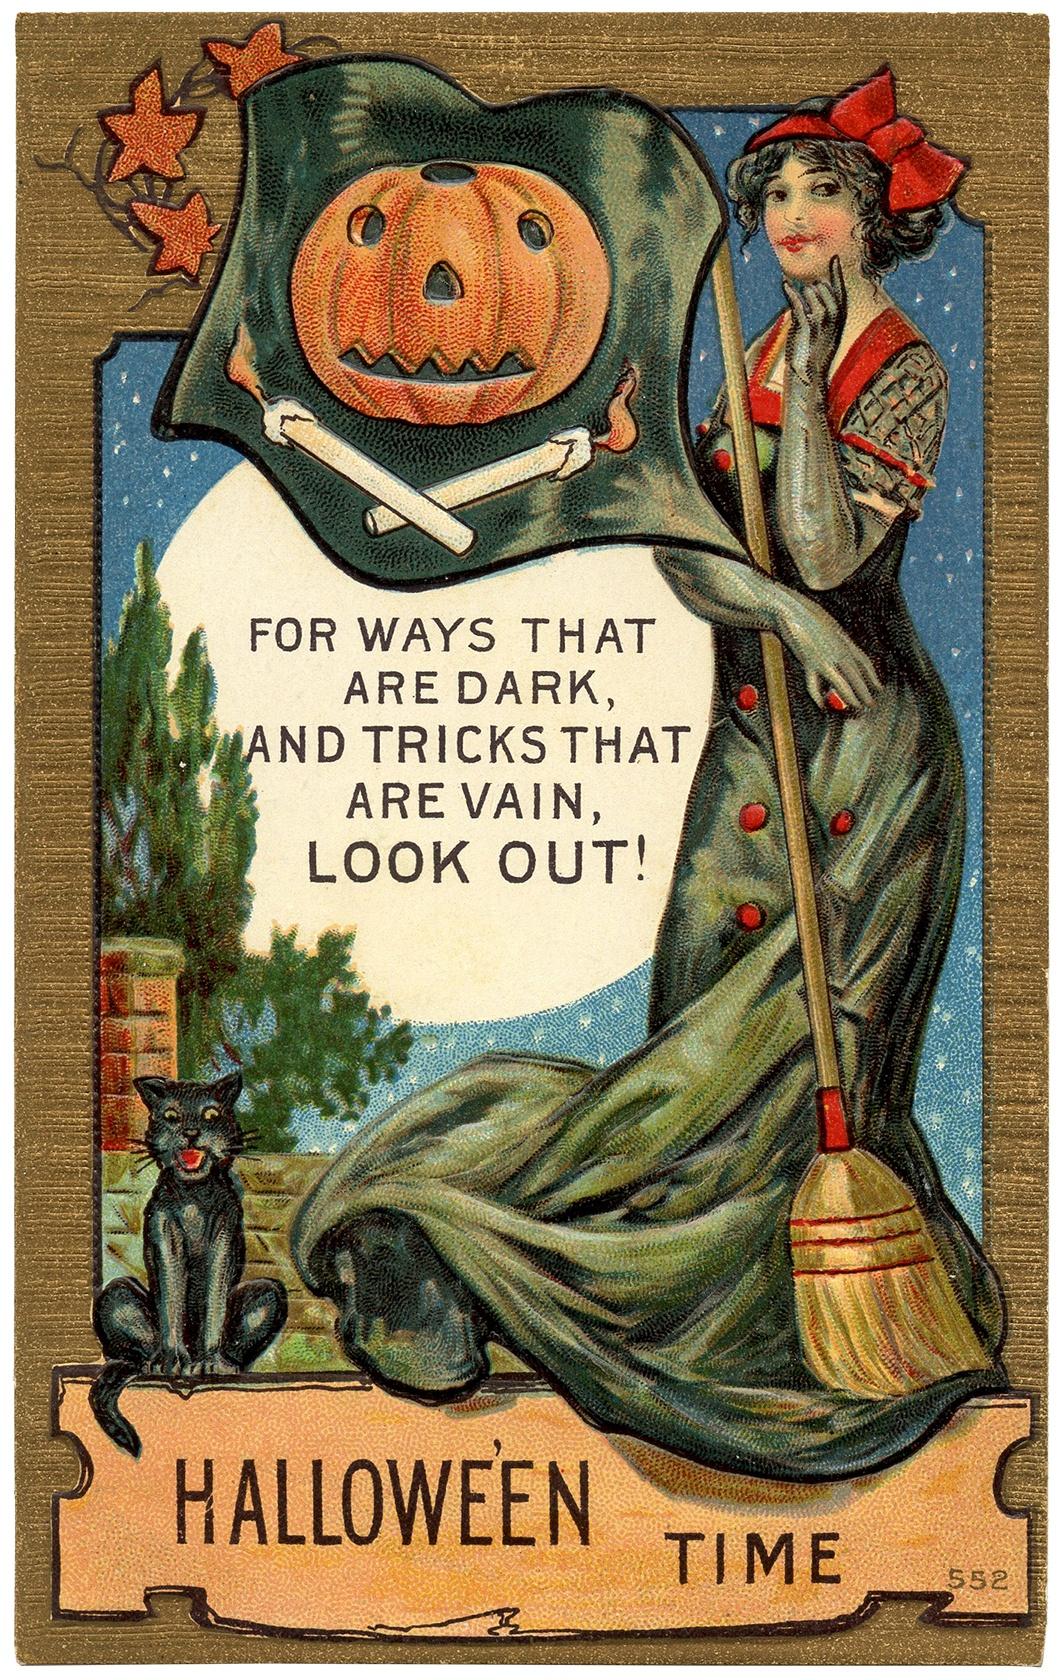 Vintage Halloween Postcard Image - The Graphics Fairy - Free Printable Vintage Halloween Images